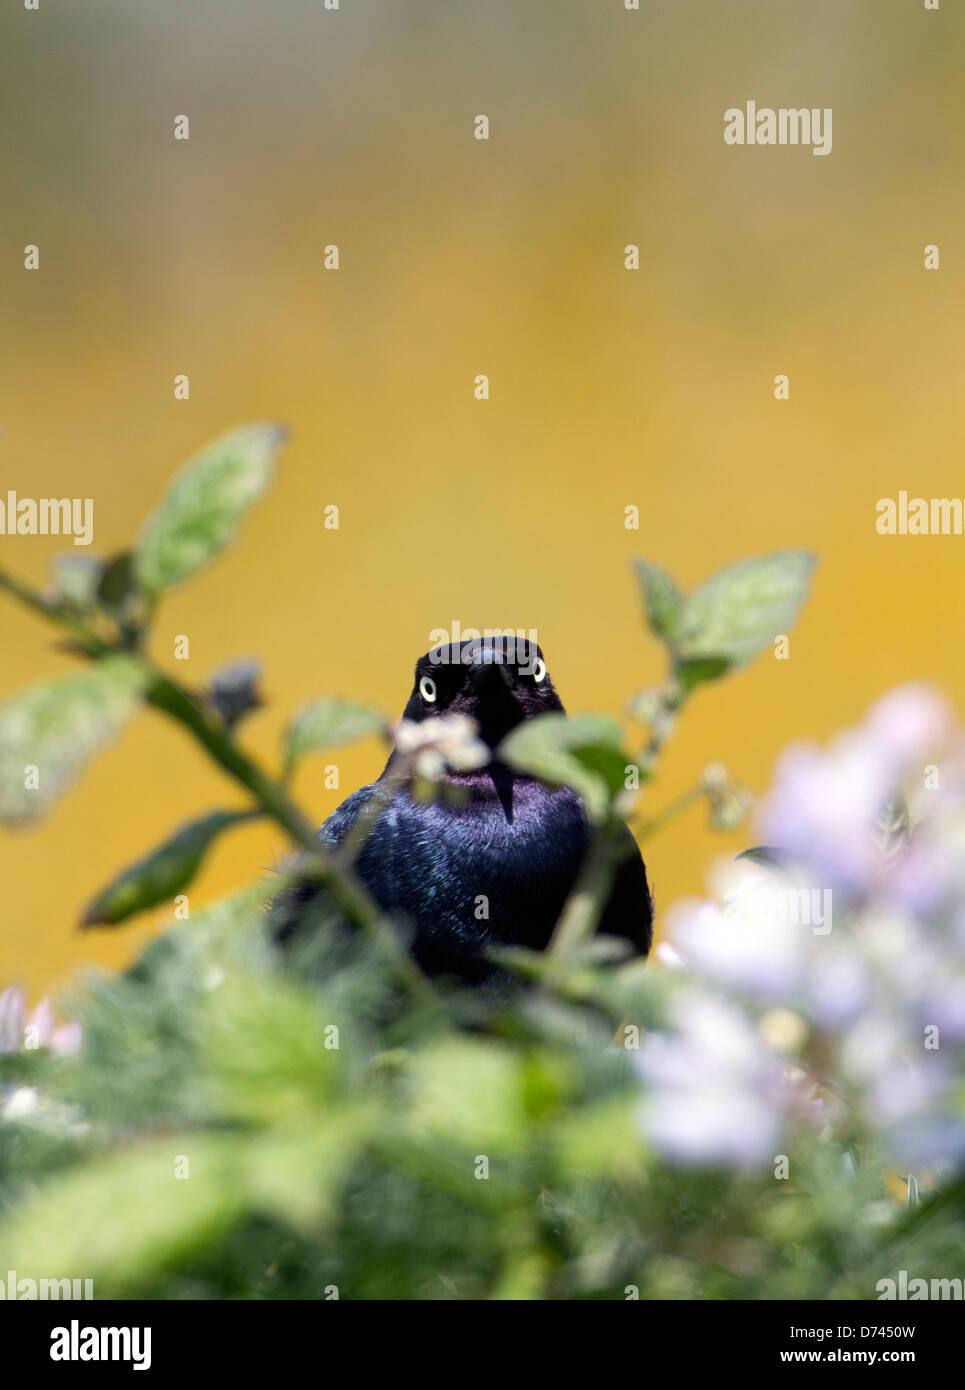 Brewer's Blackbird Peering Through Flowers - Stock Image